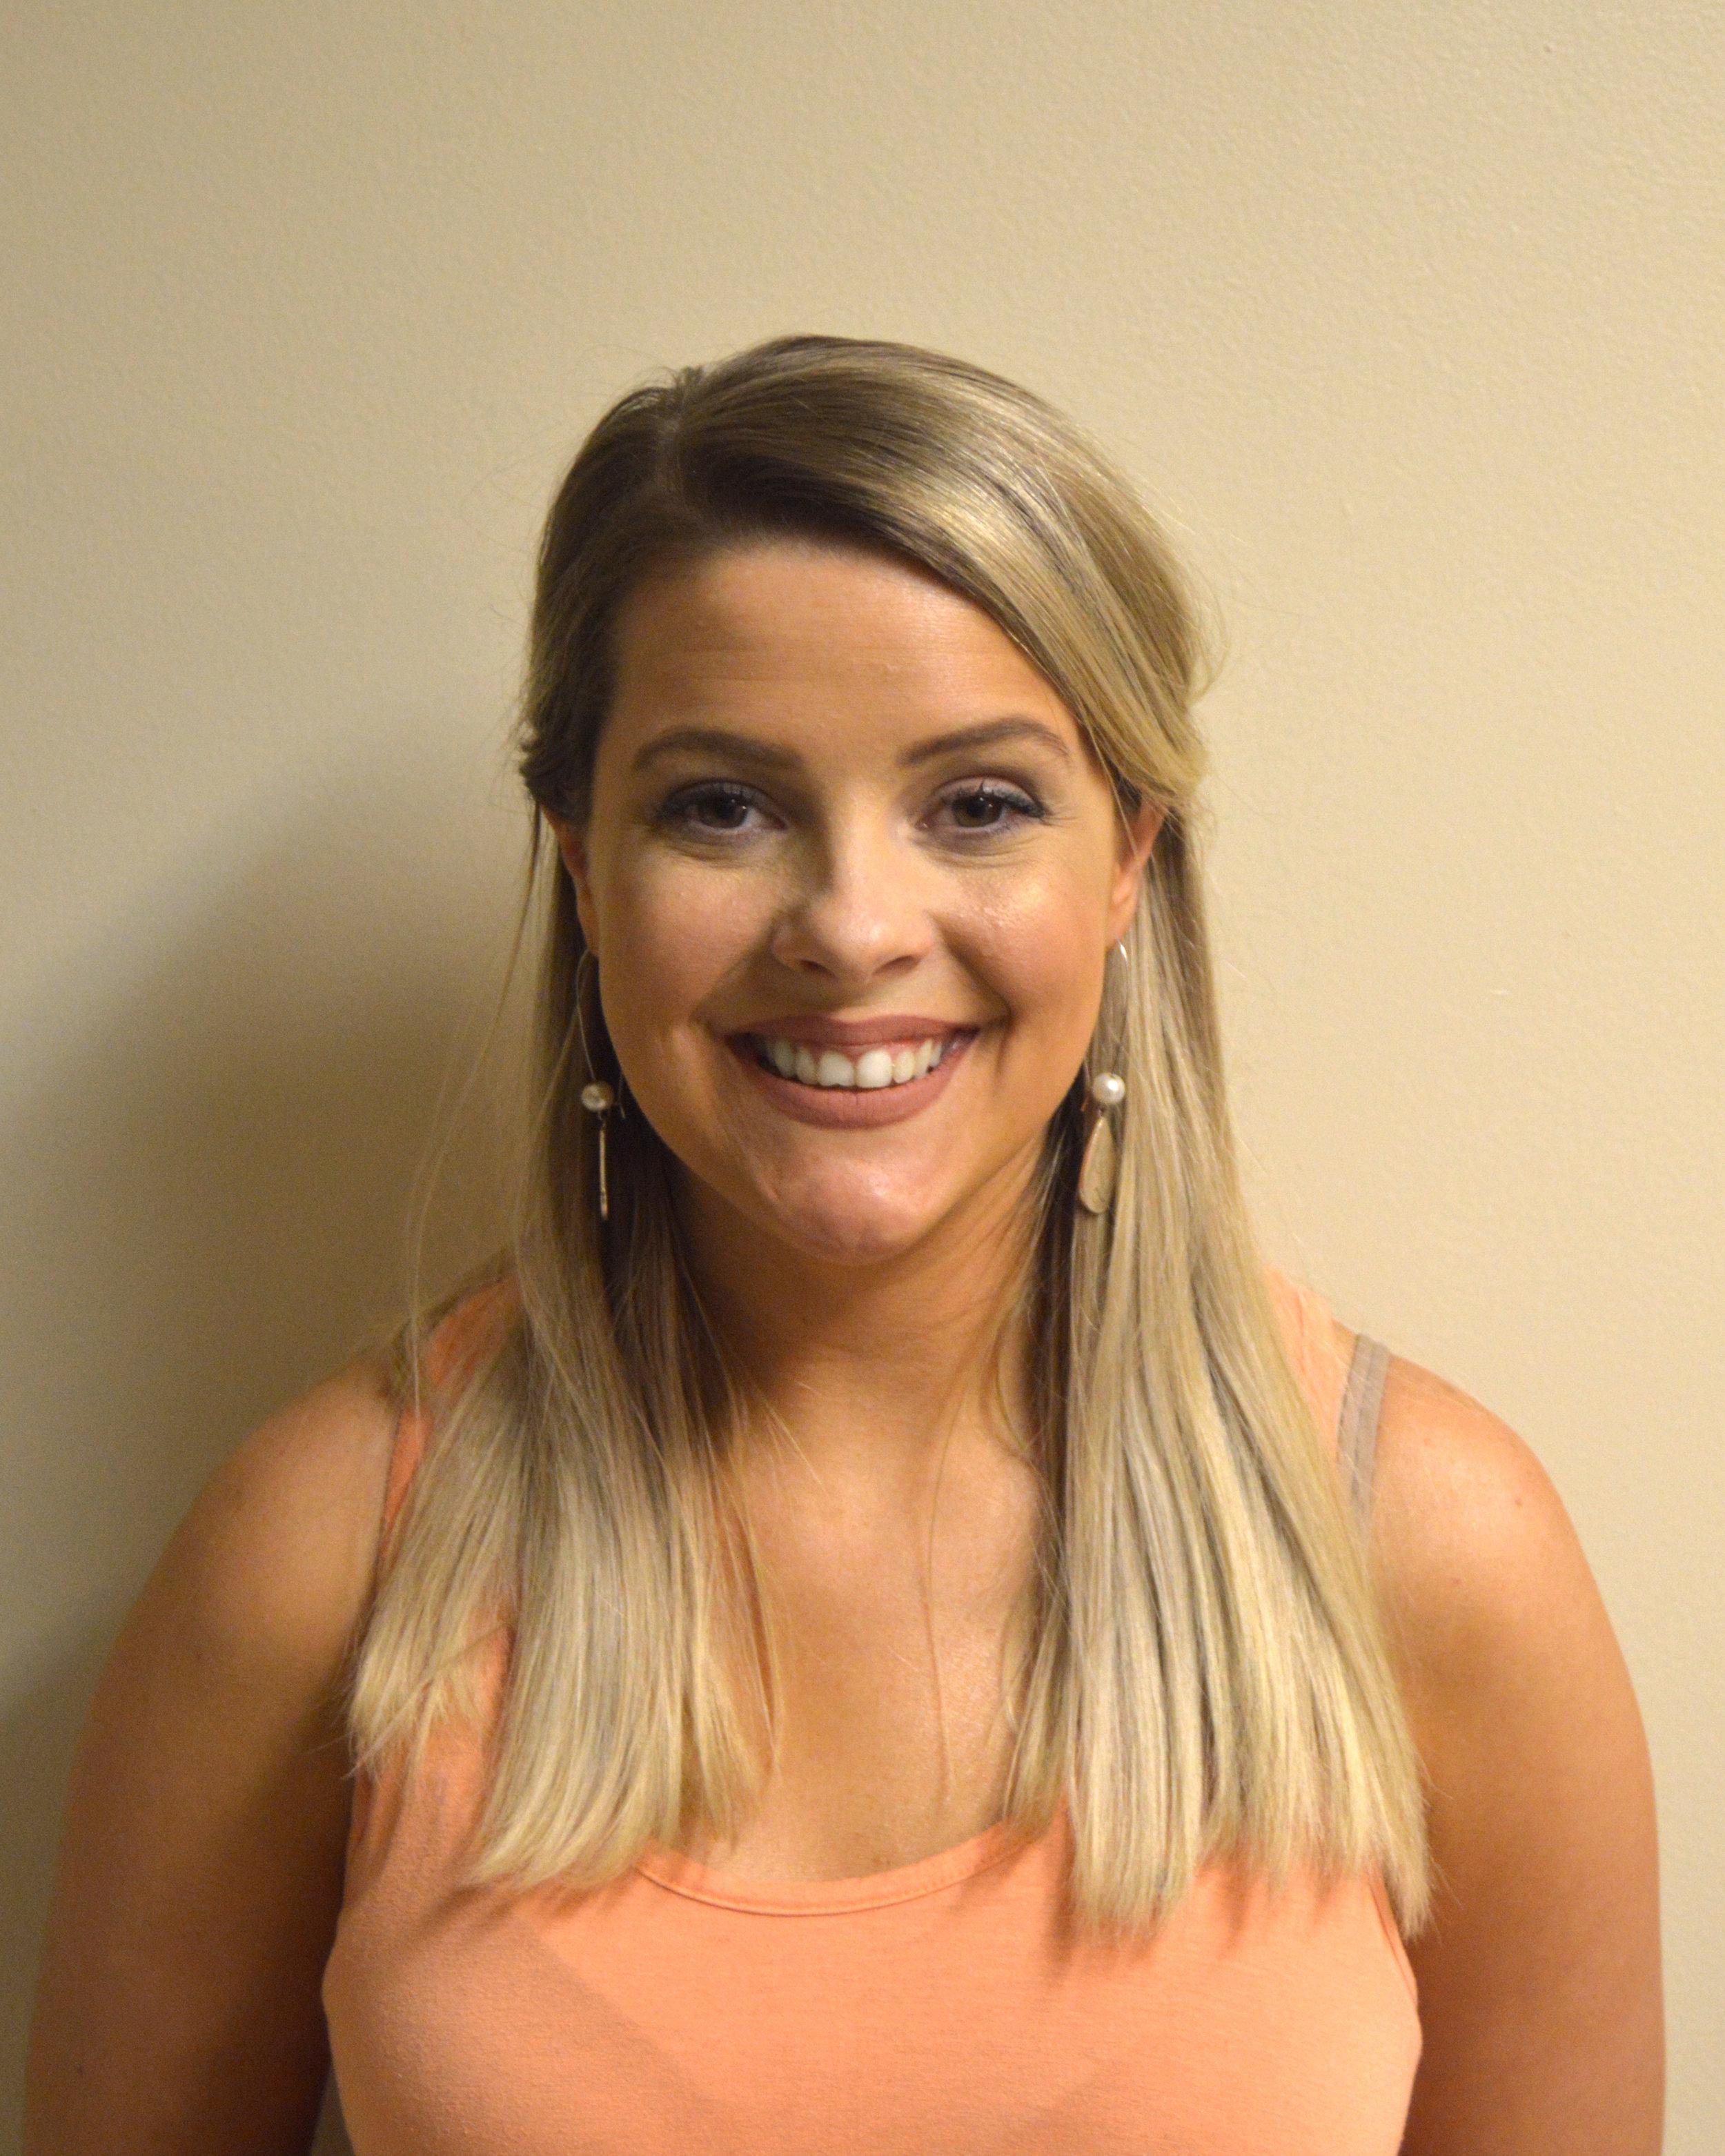 Worthy Superintendent - Leah Welborn